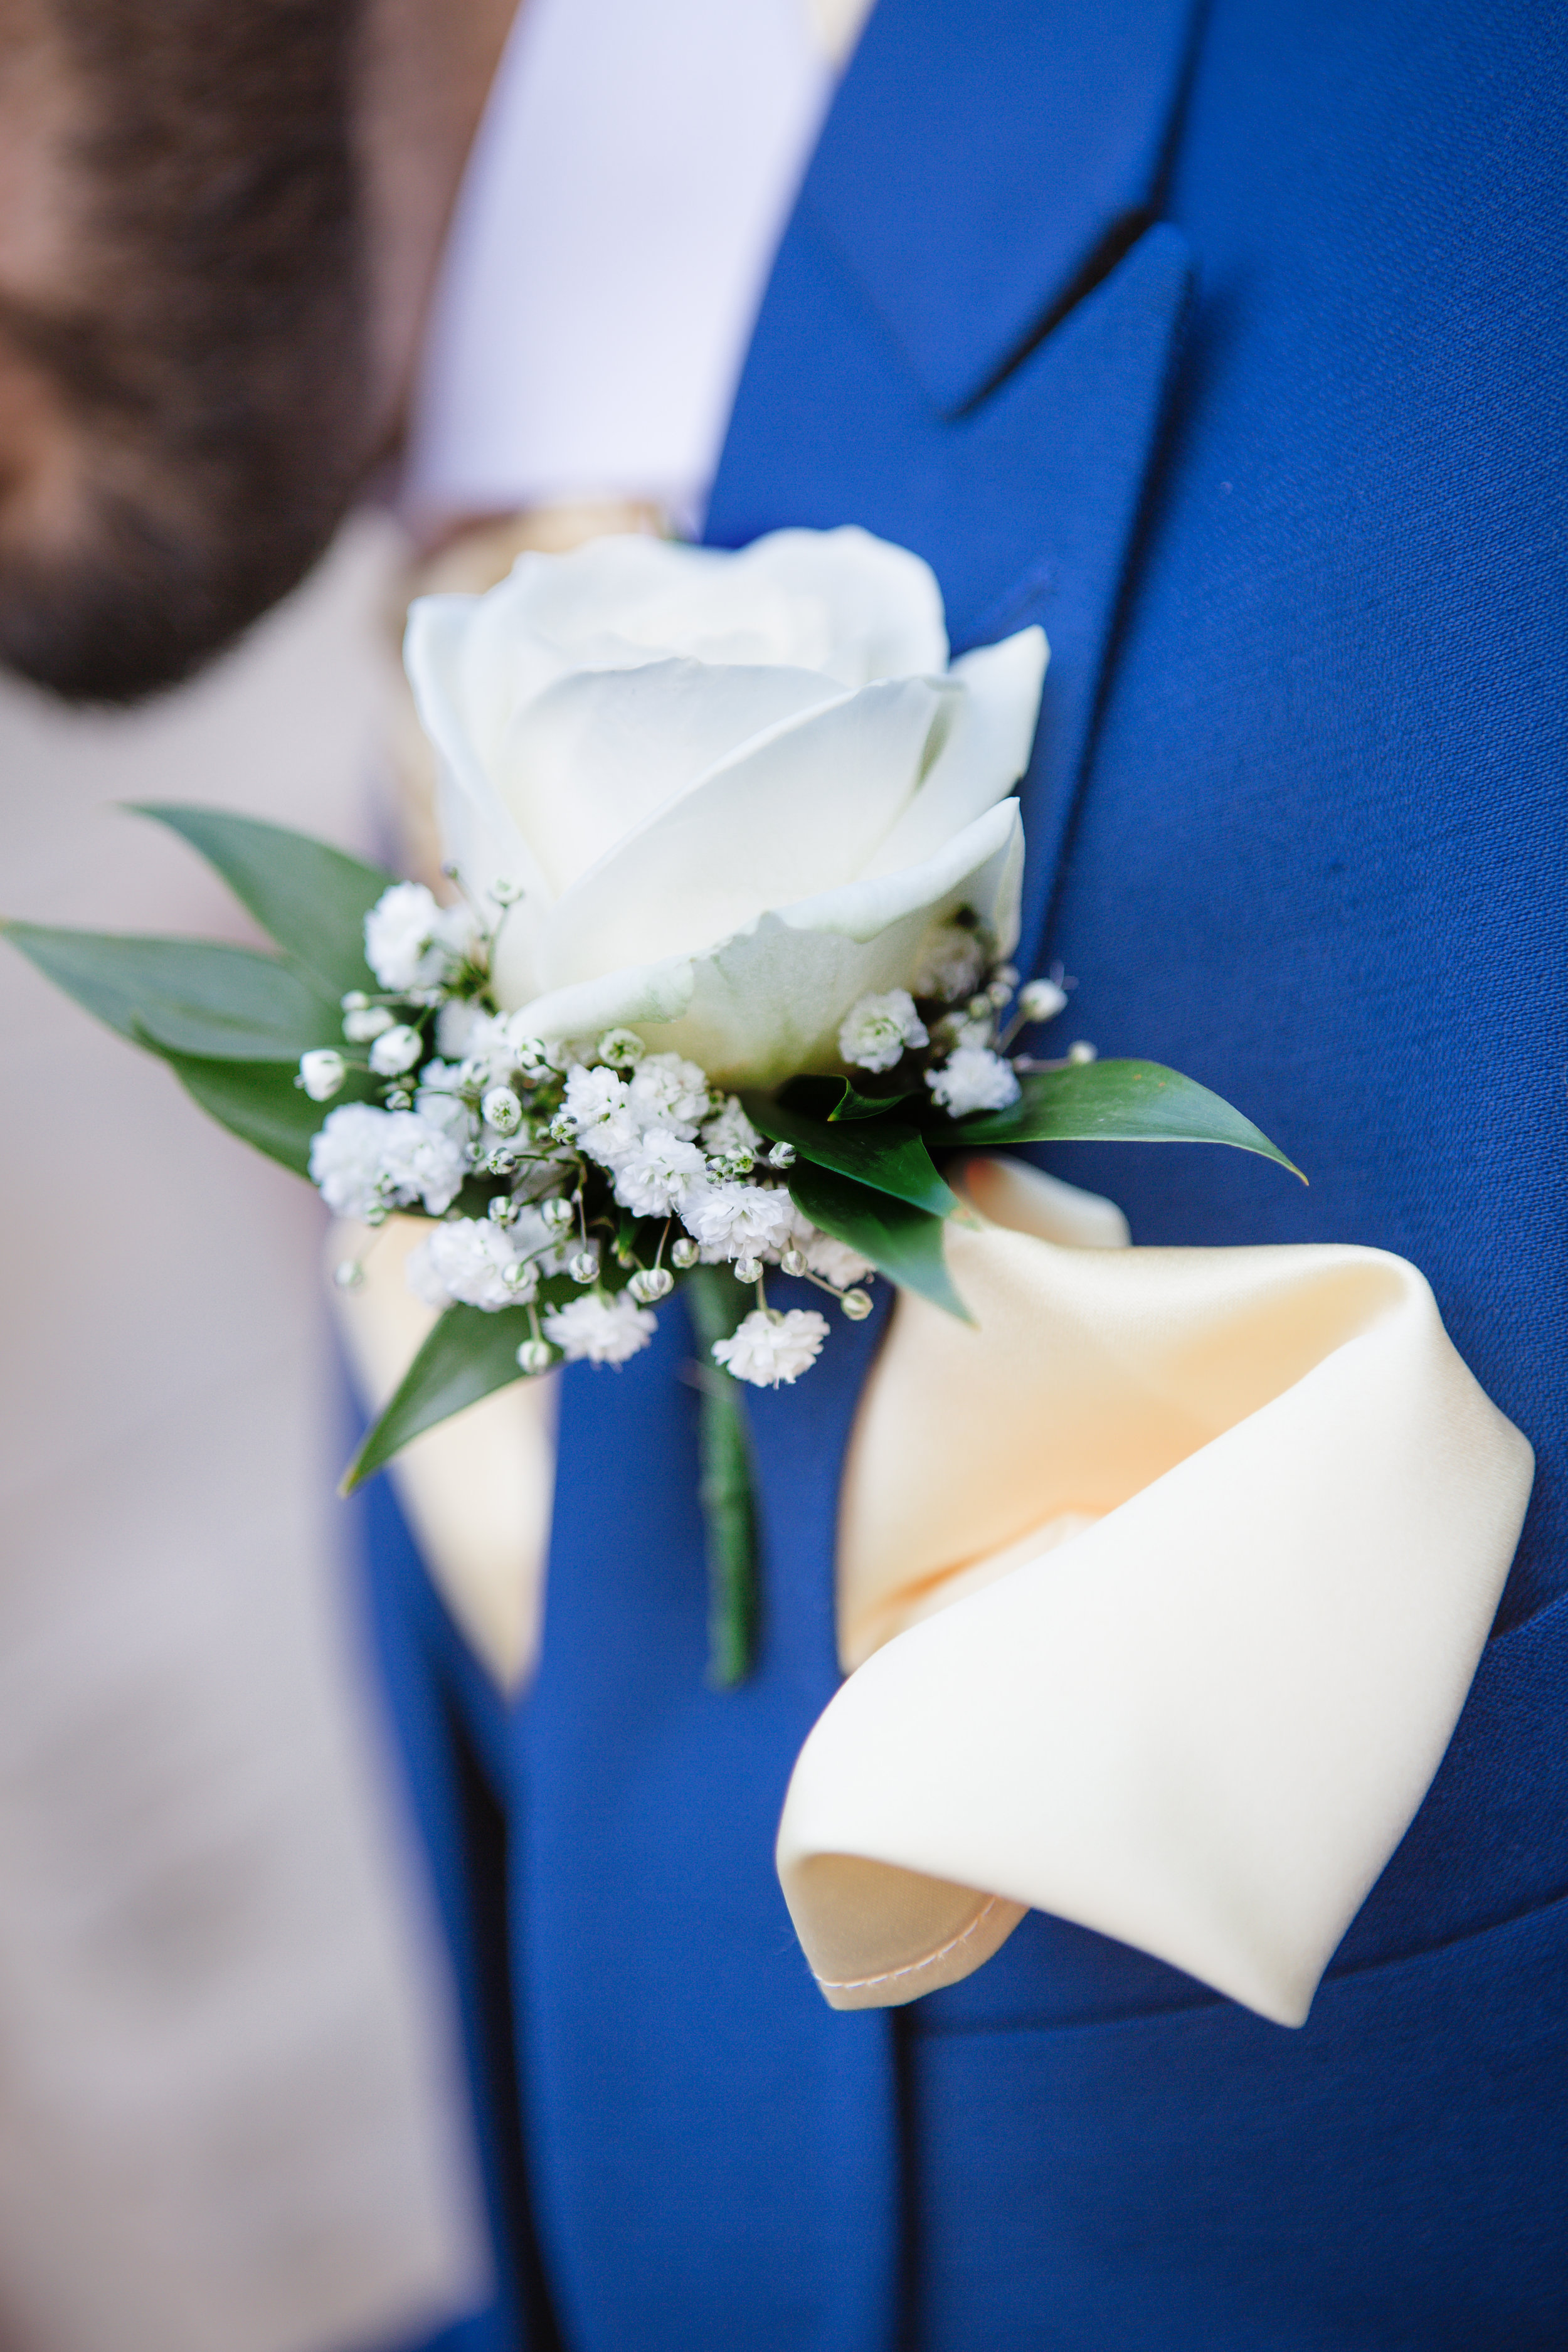 charnwood_weddings_Rothley_Court_Jess_Ali254.JPG